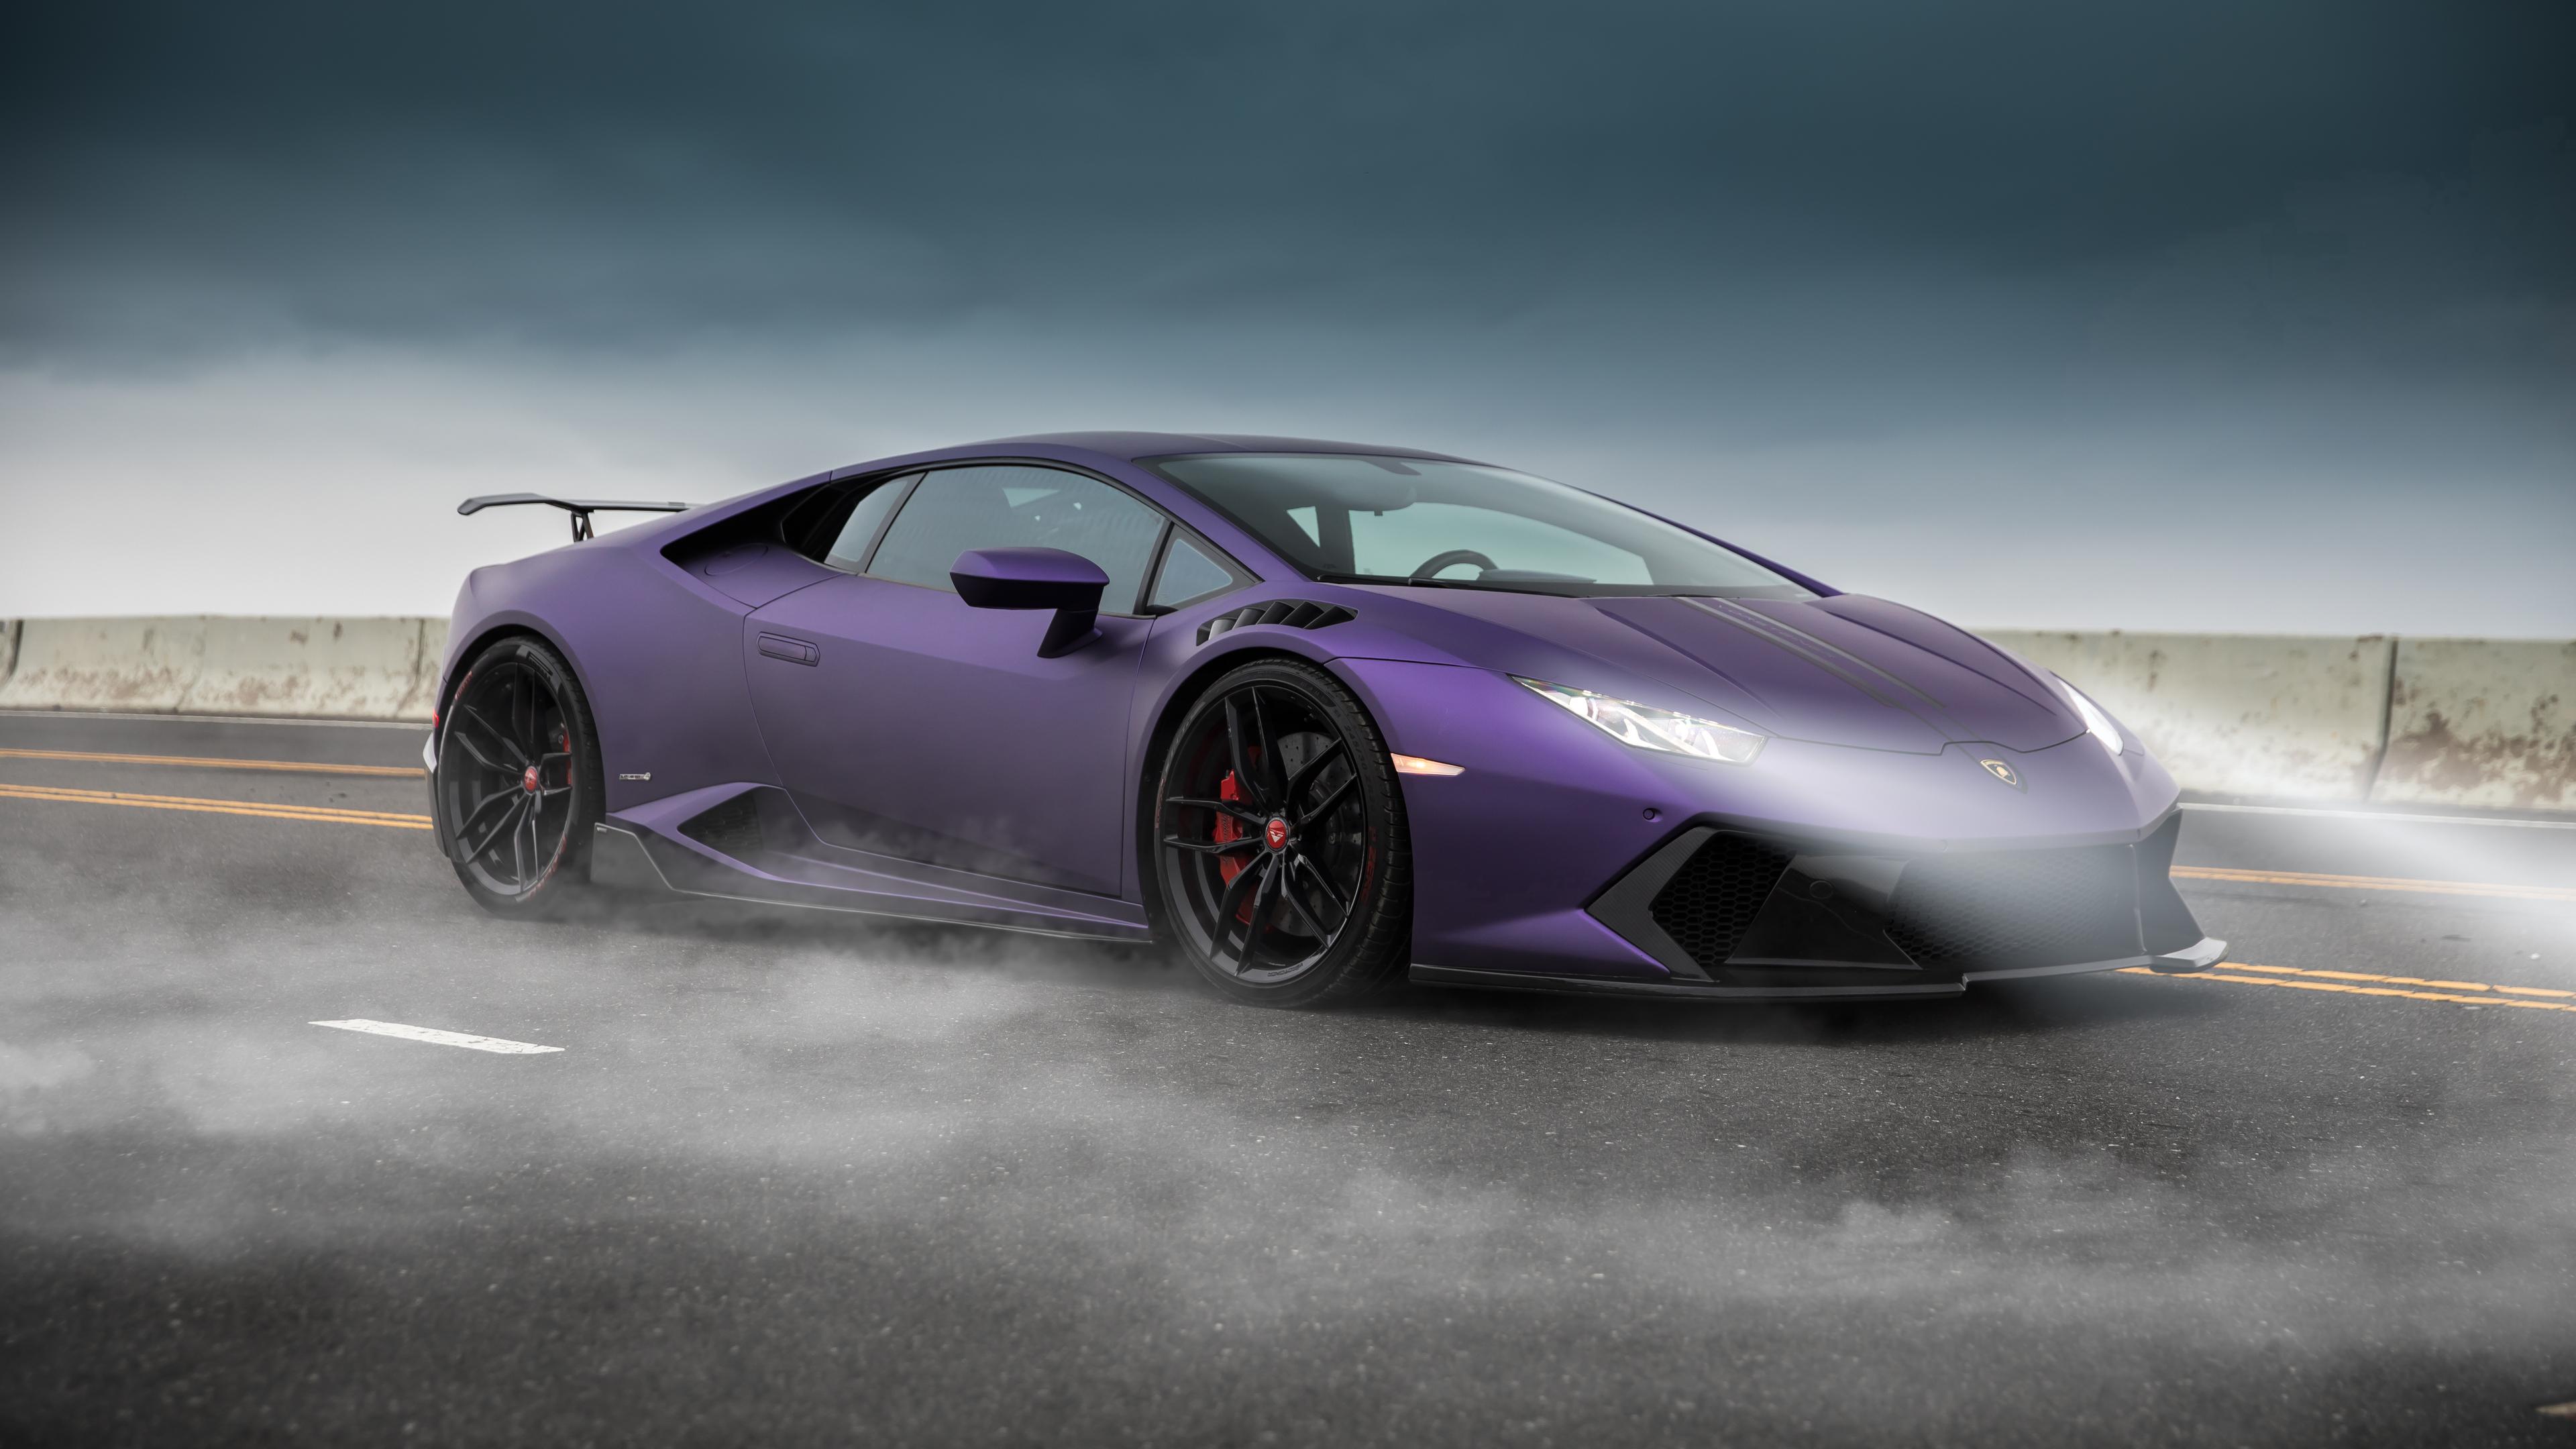 Wallpaper 4k Purple Lamborghini 4k 4k Wallpapers 5k